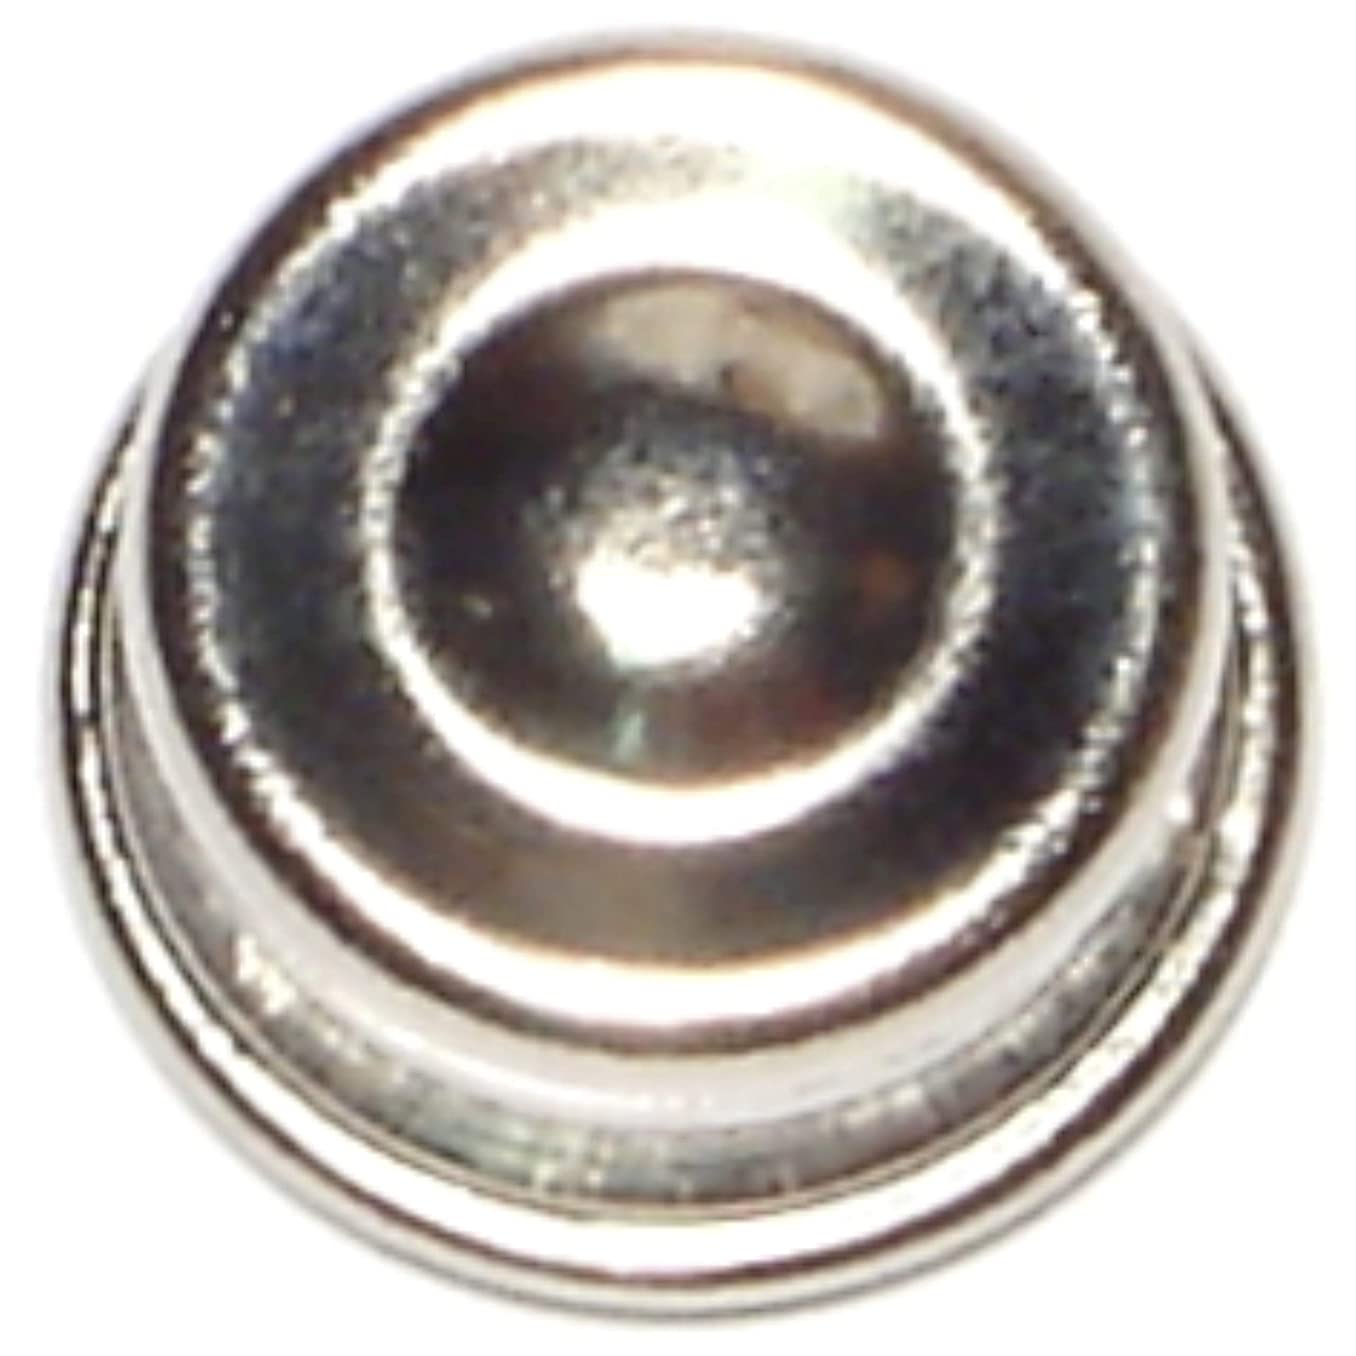 Hard-to-Find Fastener 014973137342 Hub Cap Push Nut, 1/4 Chrome, Piece-12